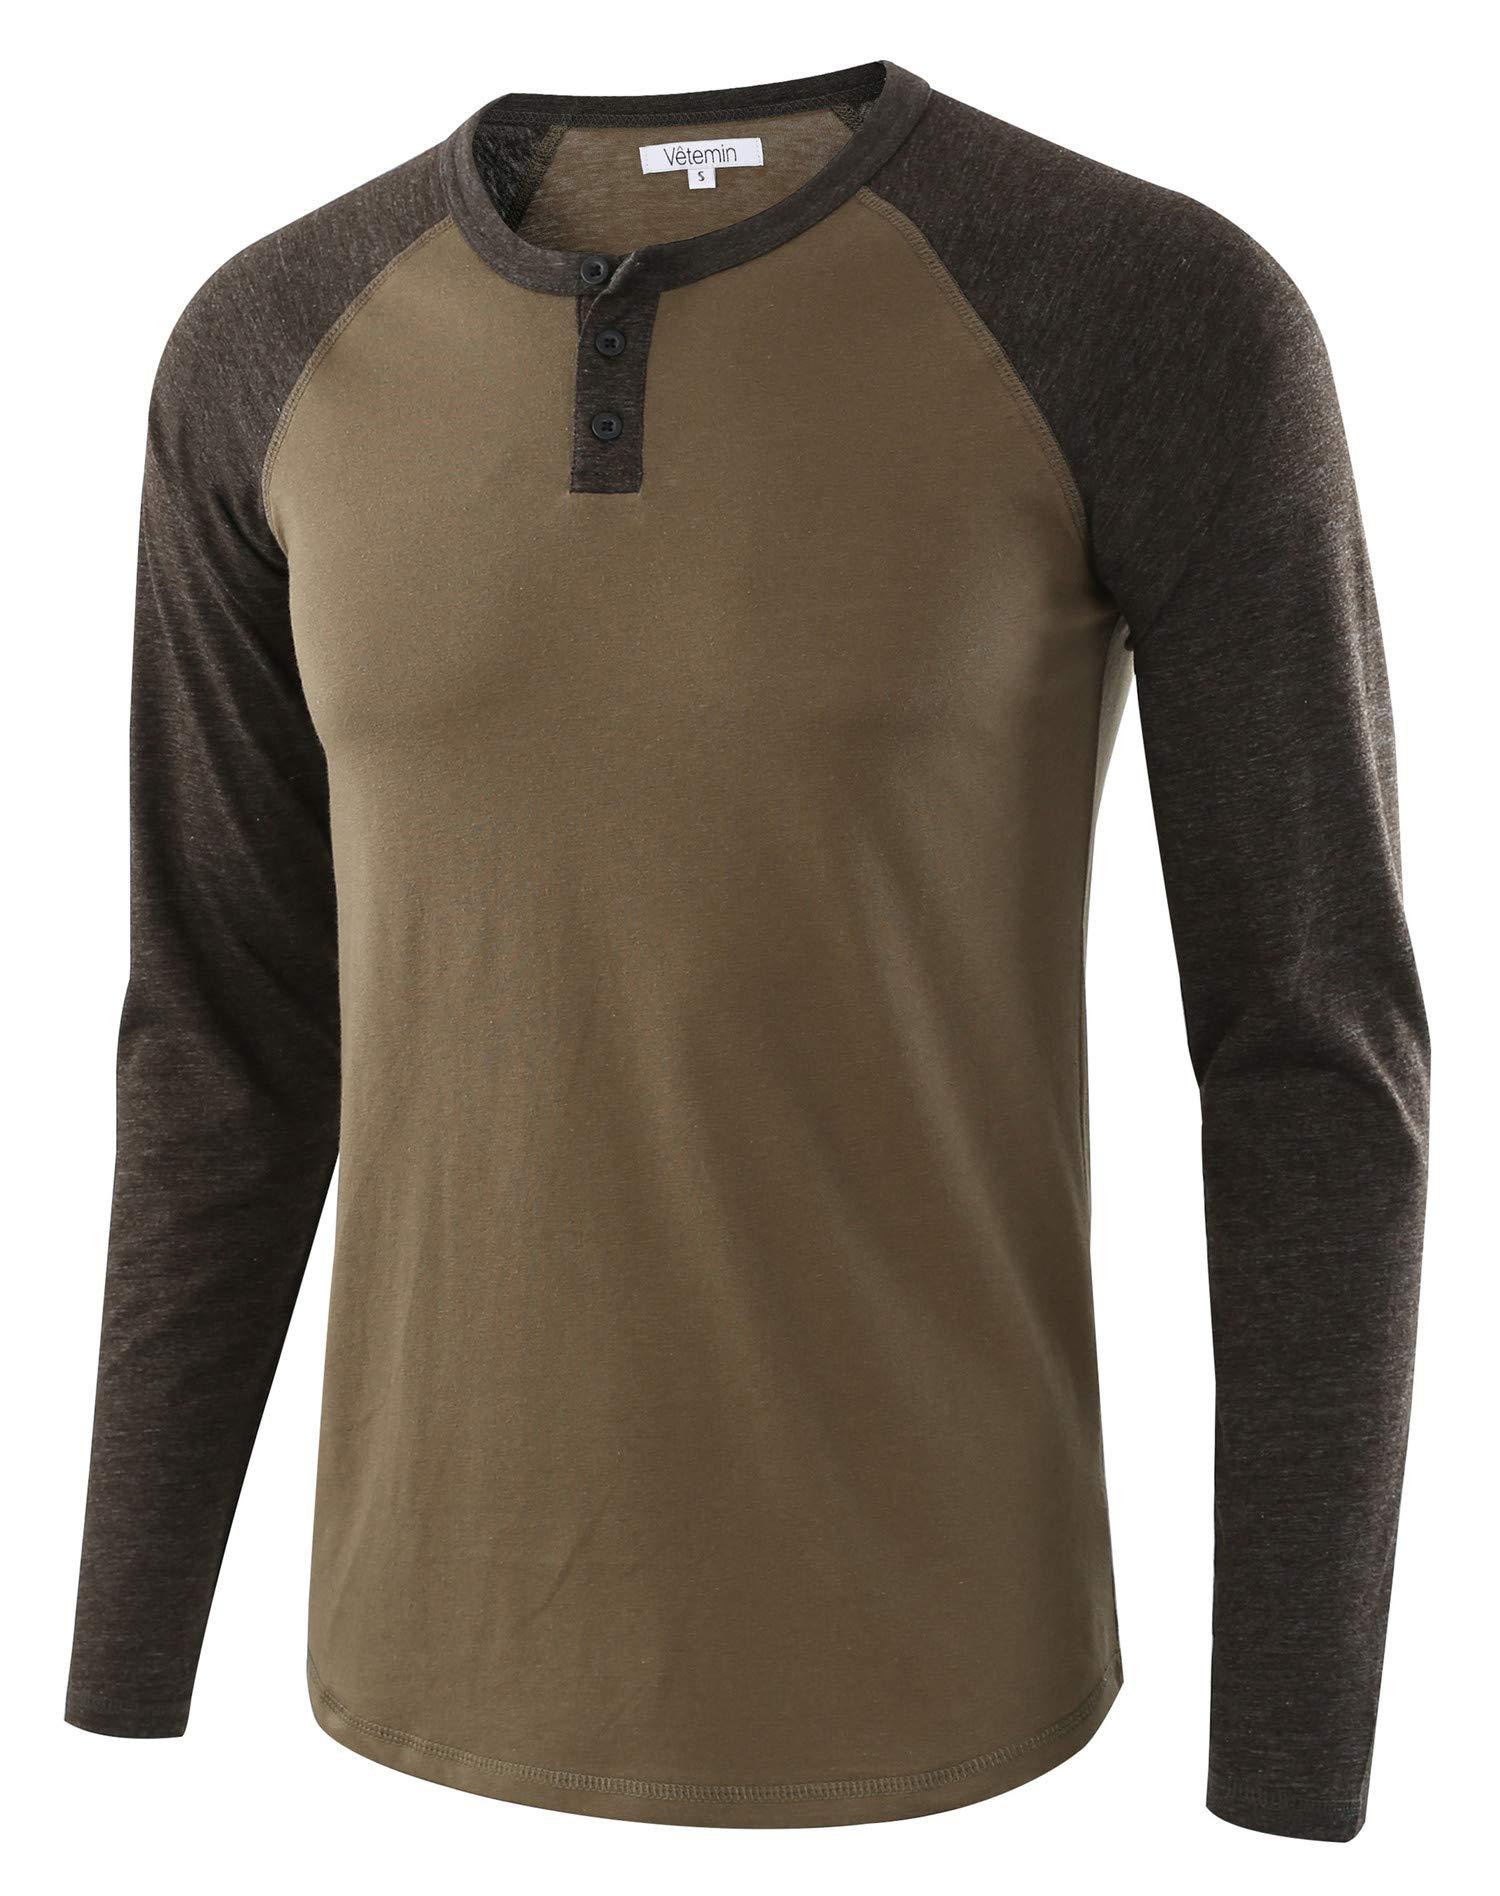 HETHCODE Mens Casual Raglan Fit Soft Baseball 3//4 Sleeve Henley T-Shirts Tee